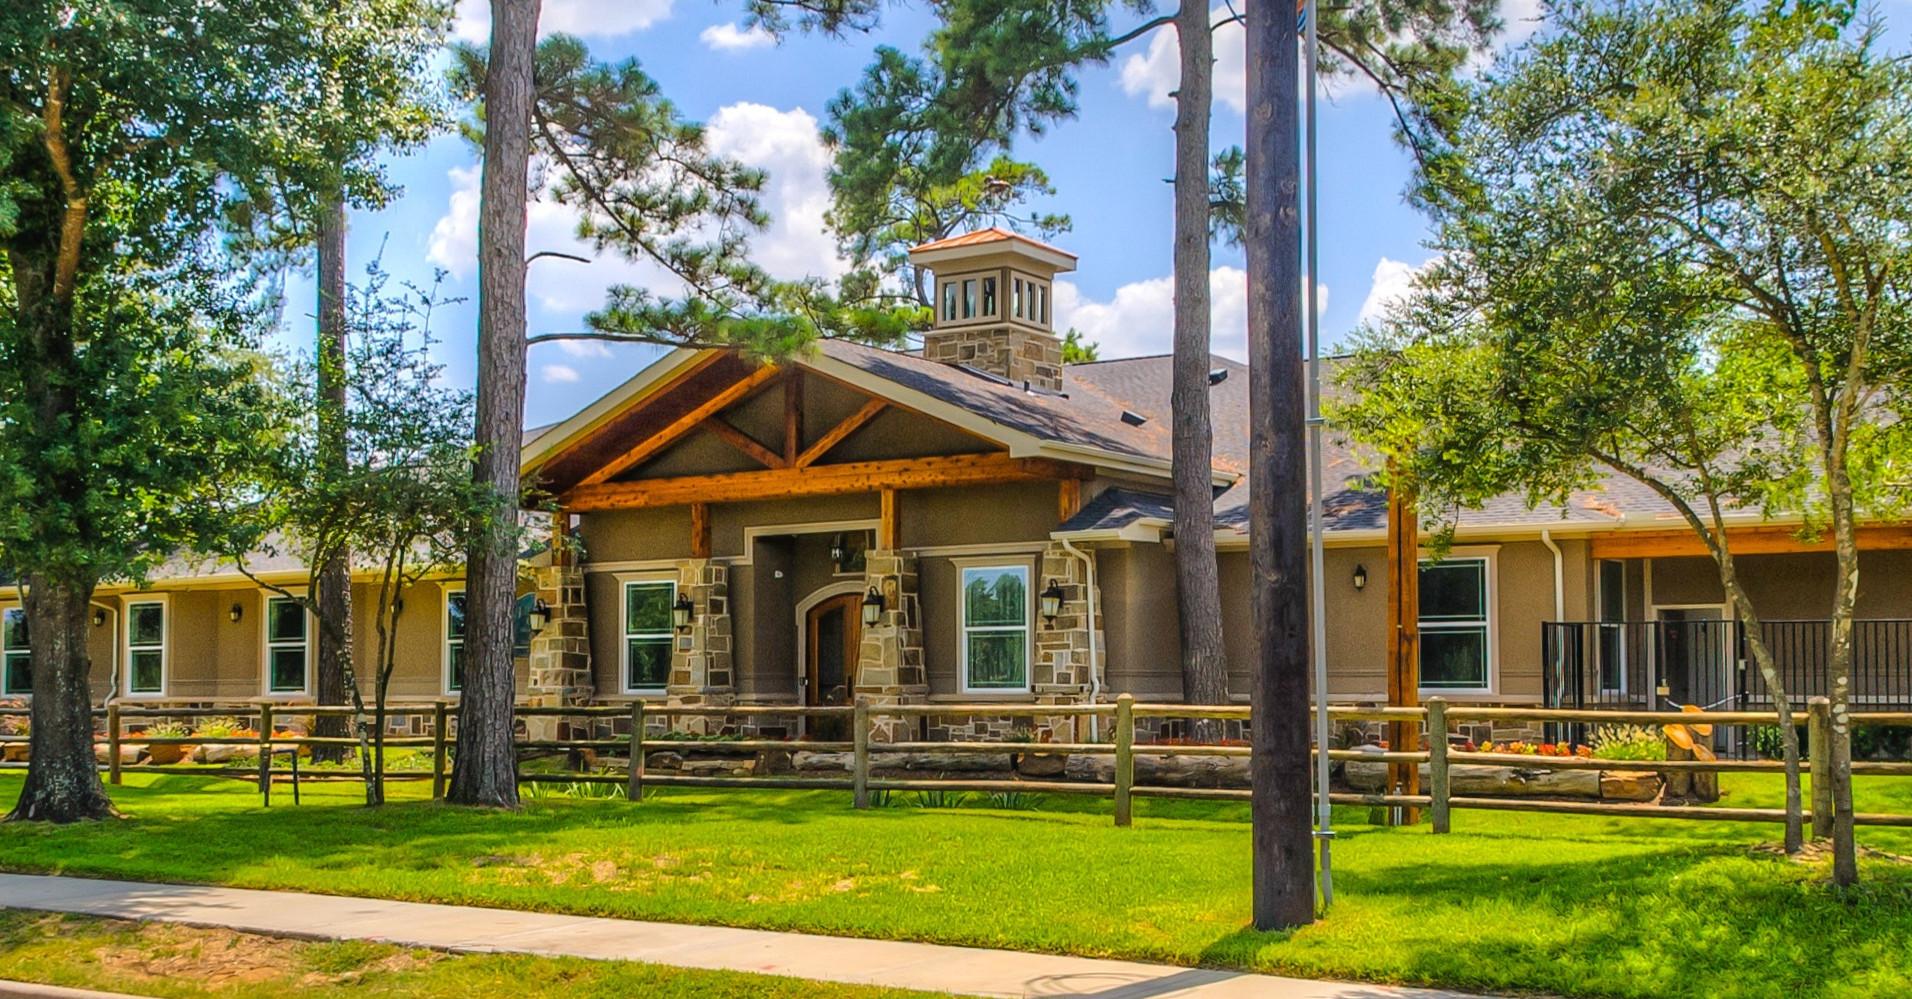 Village Green Alzheimer's Care Home - Champions